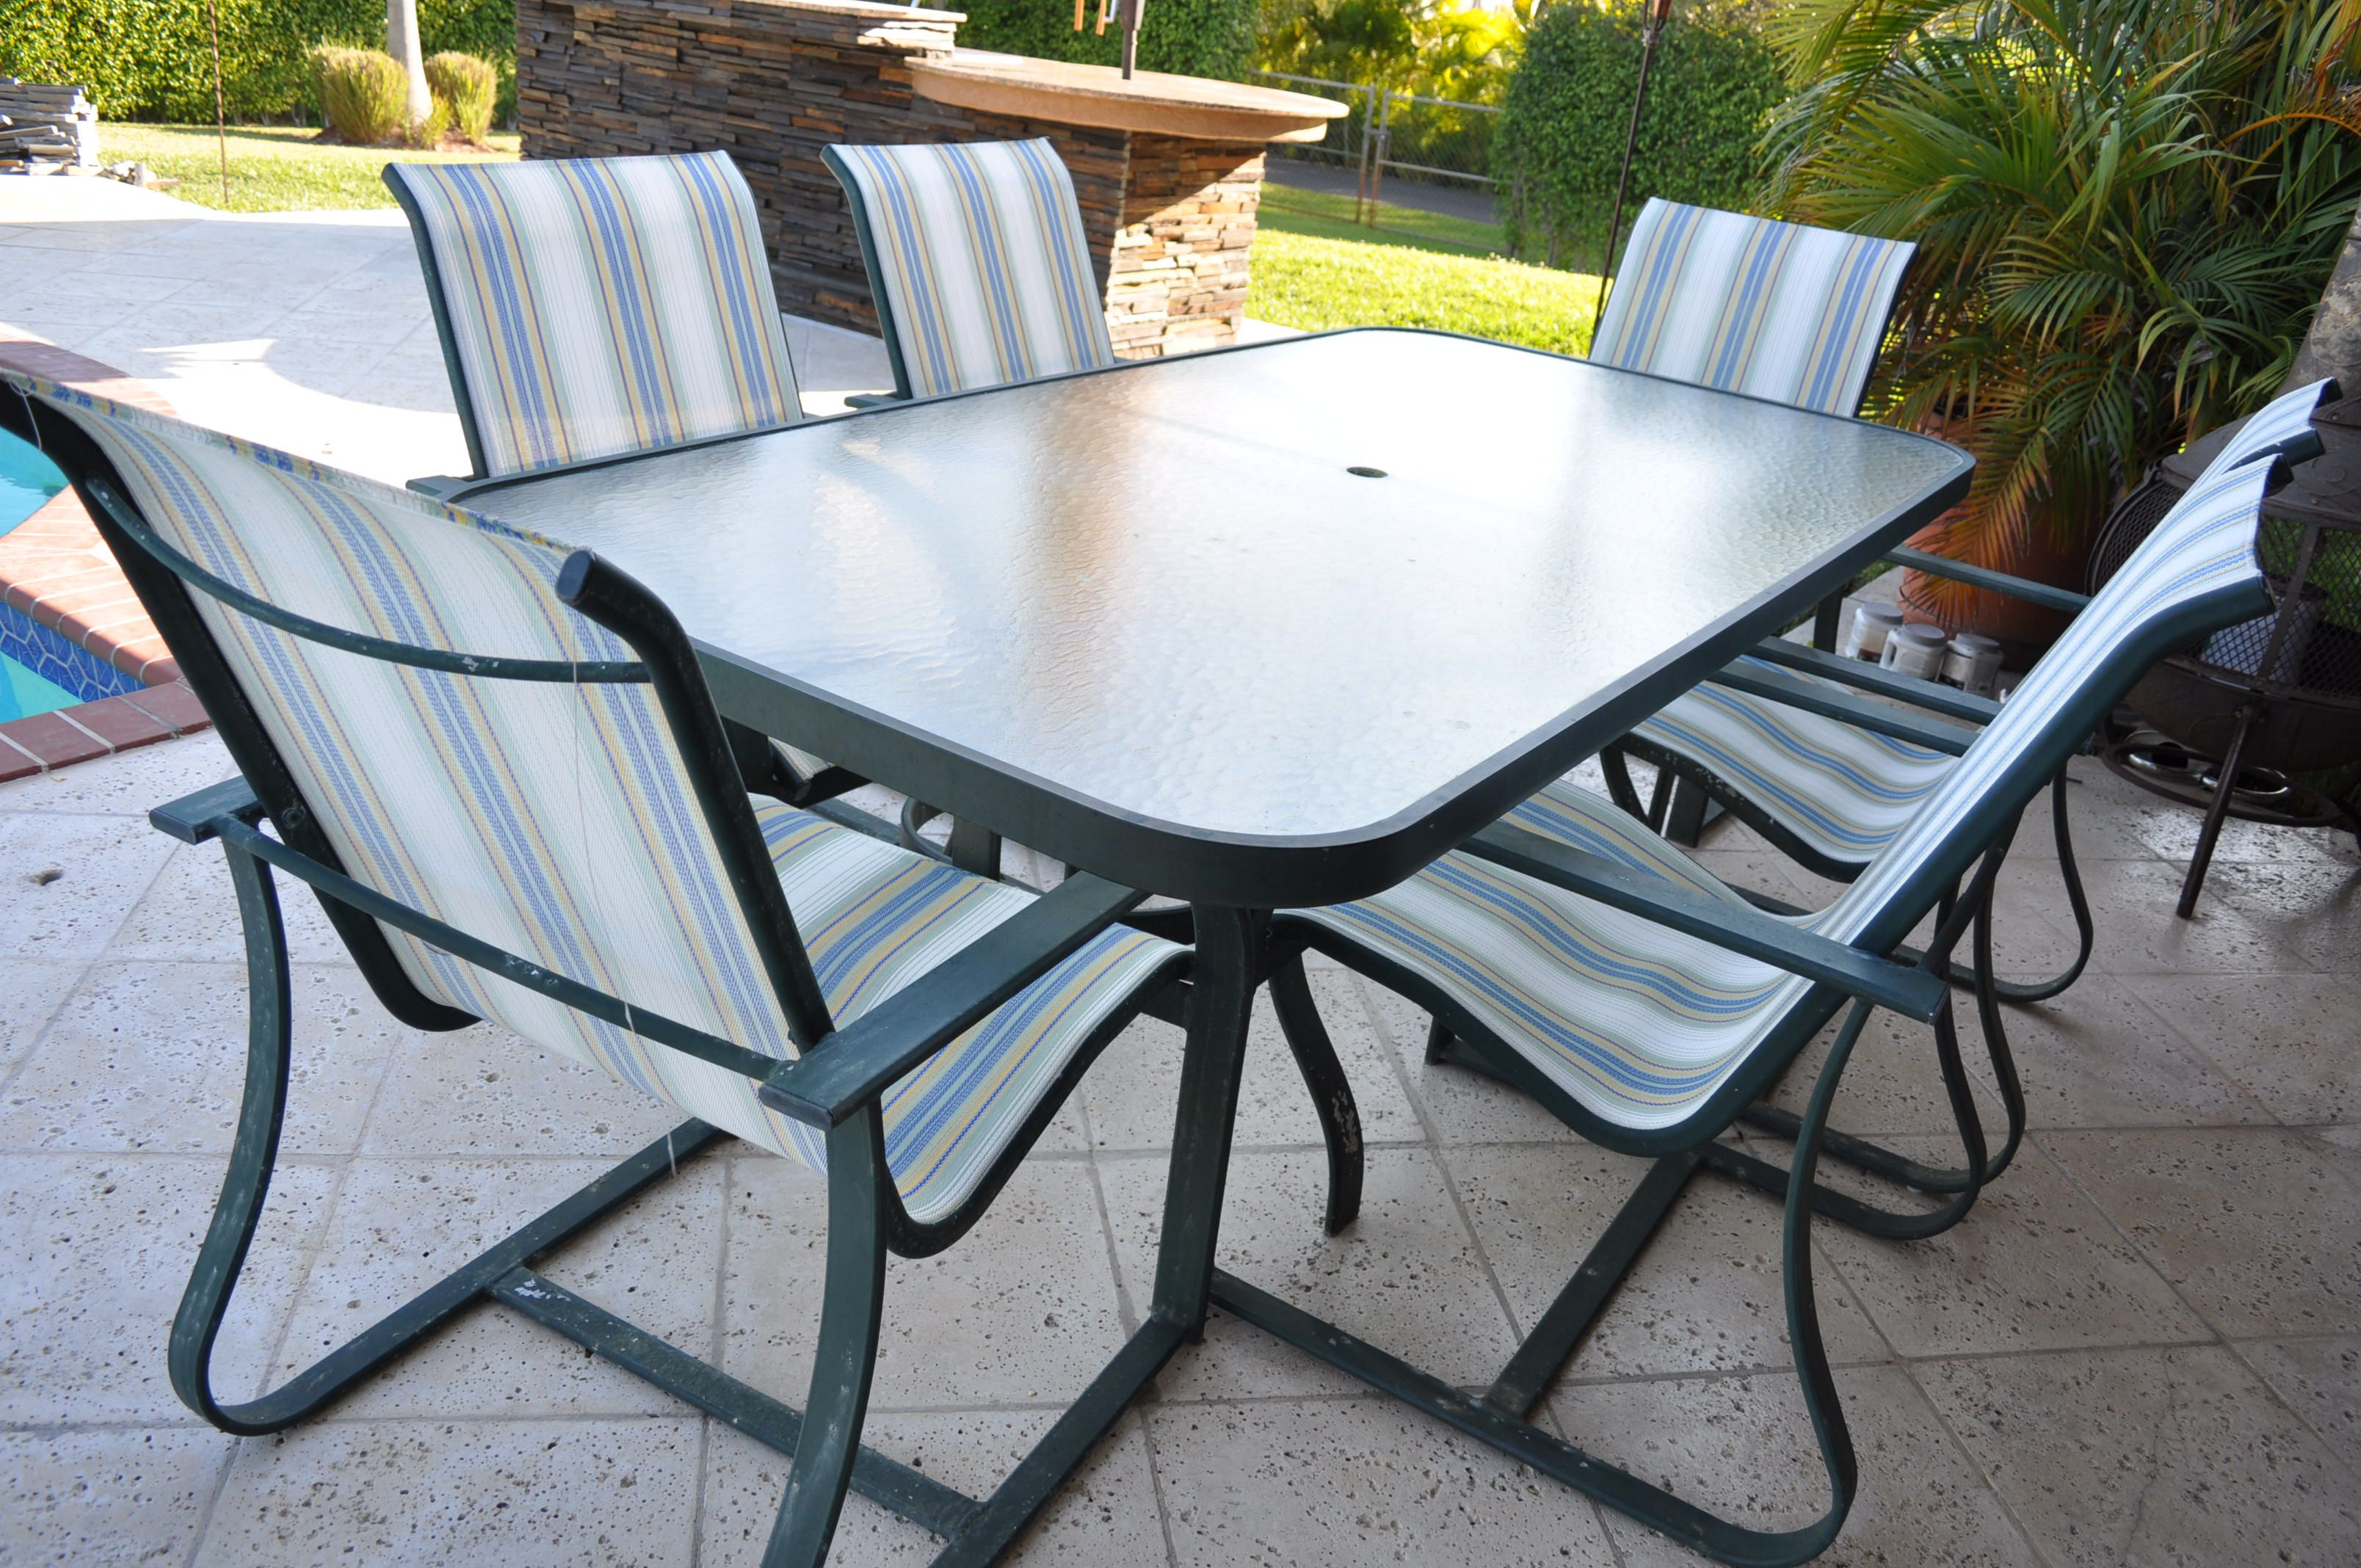 Balcony Table And Chairs Aussenmobel Gartenmobel Tisch Und